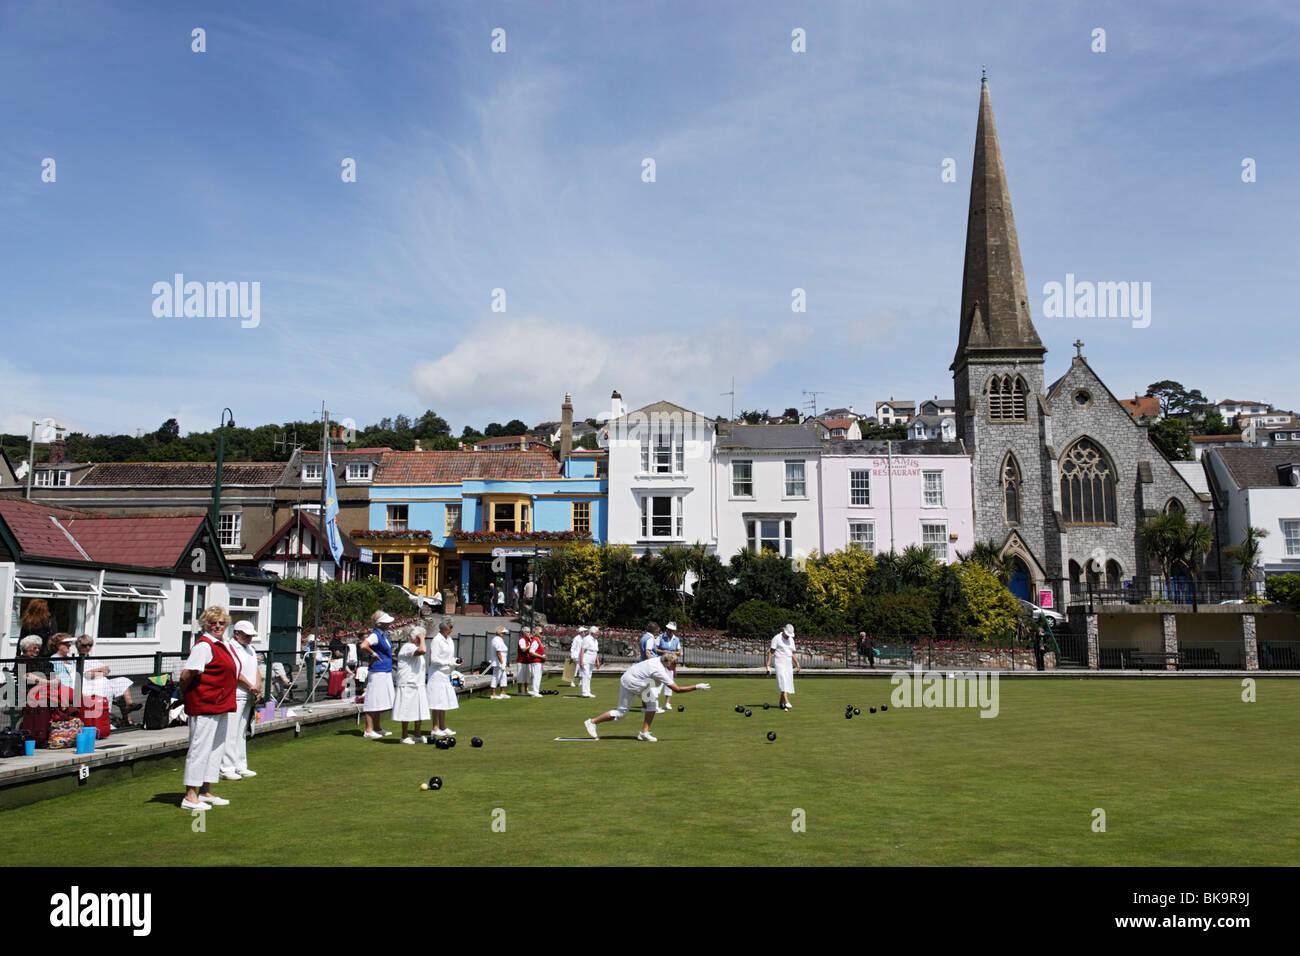 People bowling, Dawlish, Devon, England, United Kingdom - Stock Image